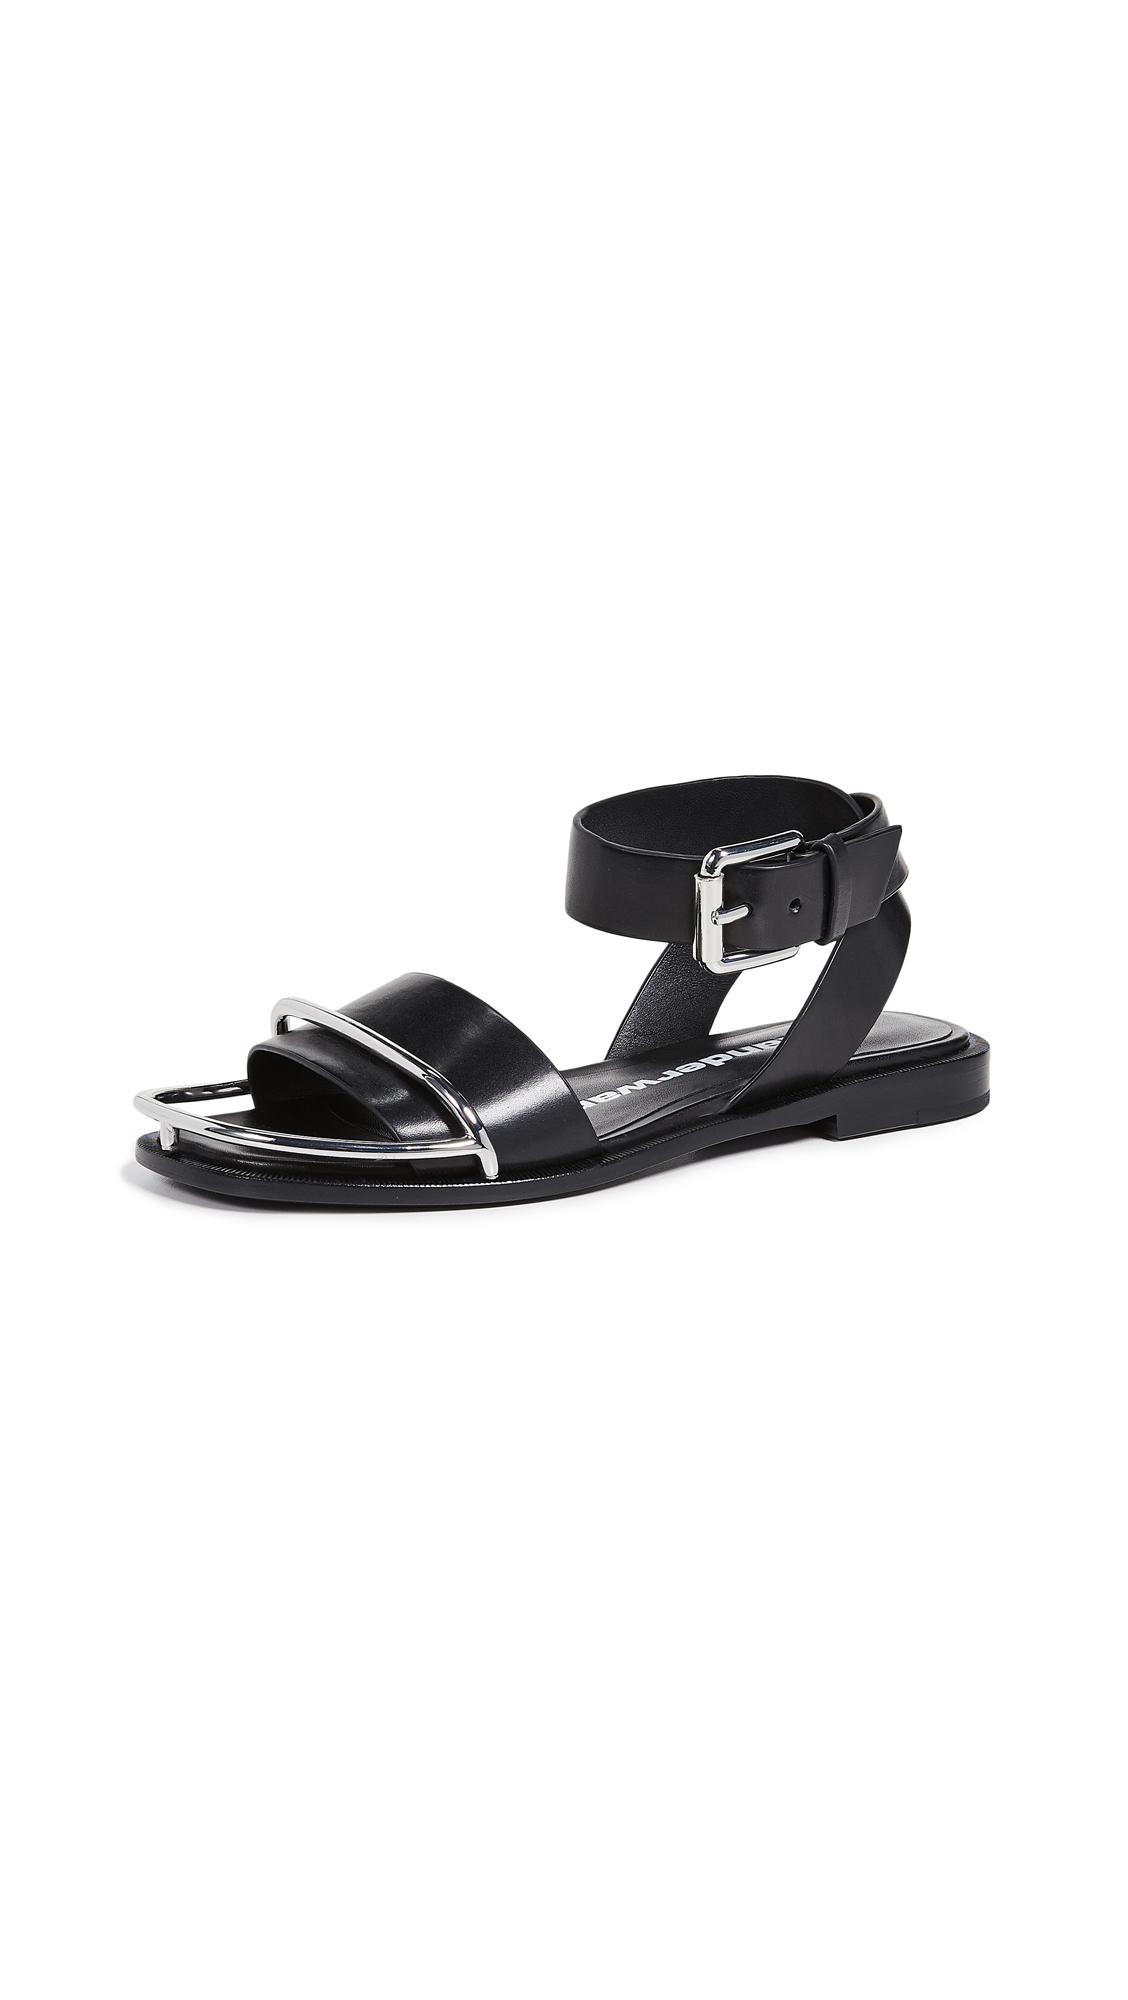 Alexander Wang Sora Halo Flat Sandals - Black